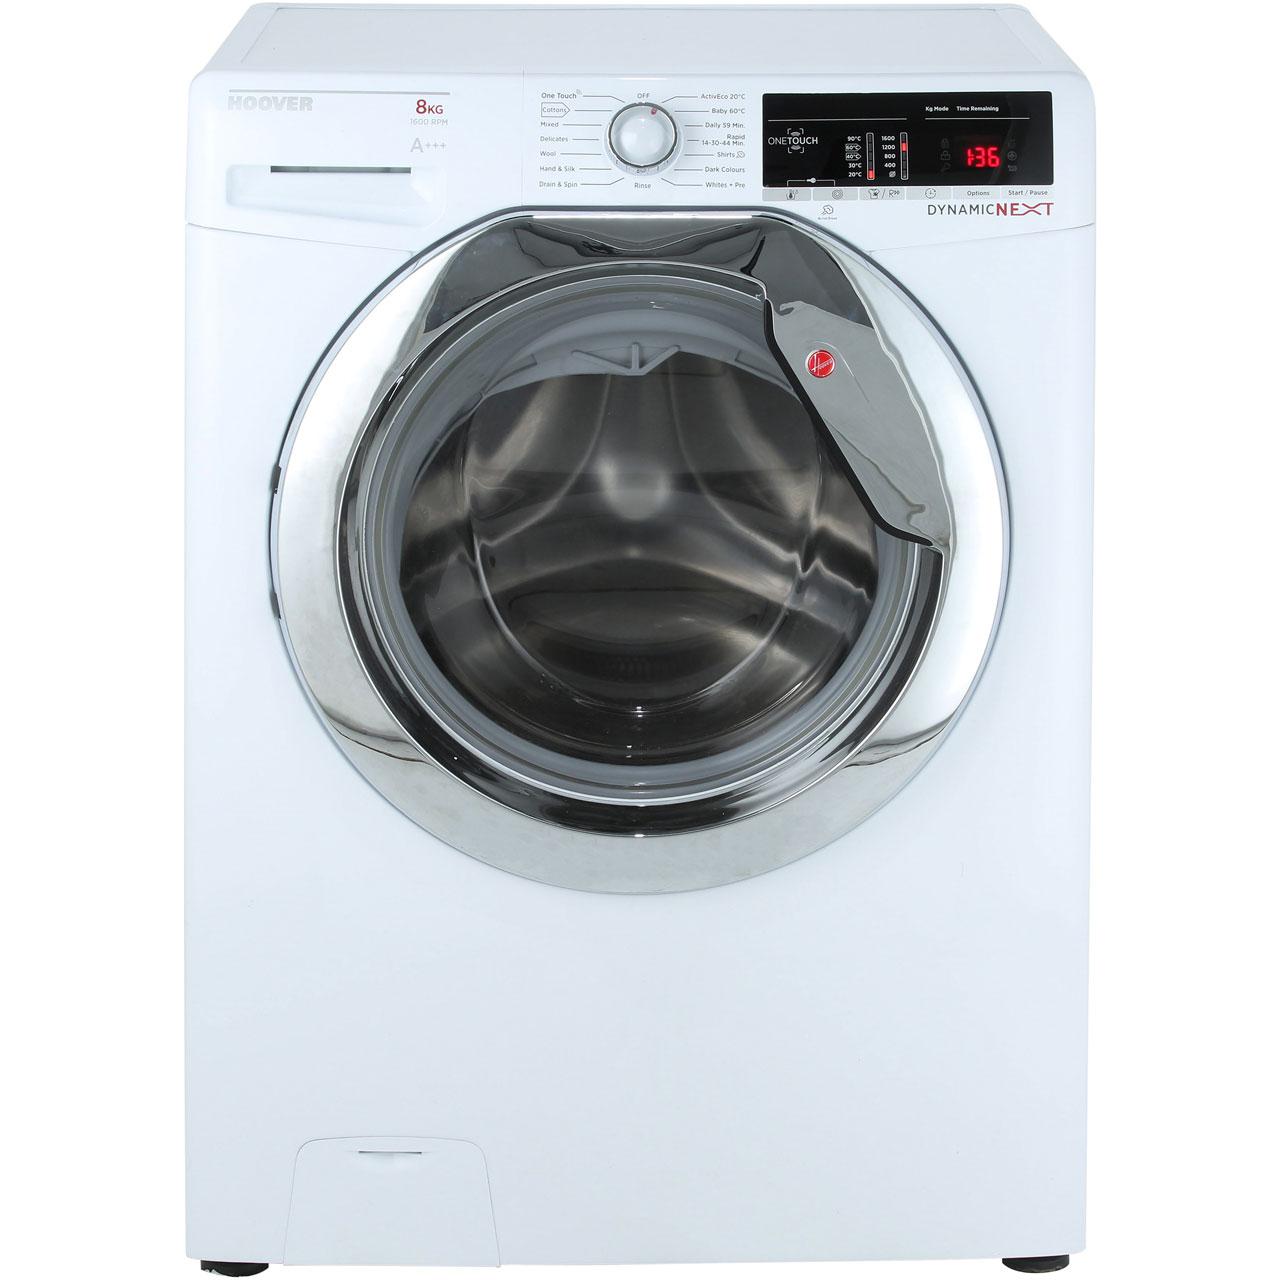 Hoover Dynamic DXOA68C3 8Kg Washing Machine 1600 RPM @ AO